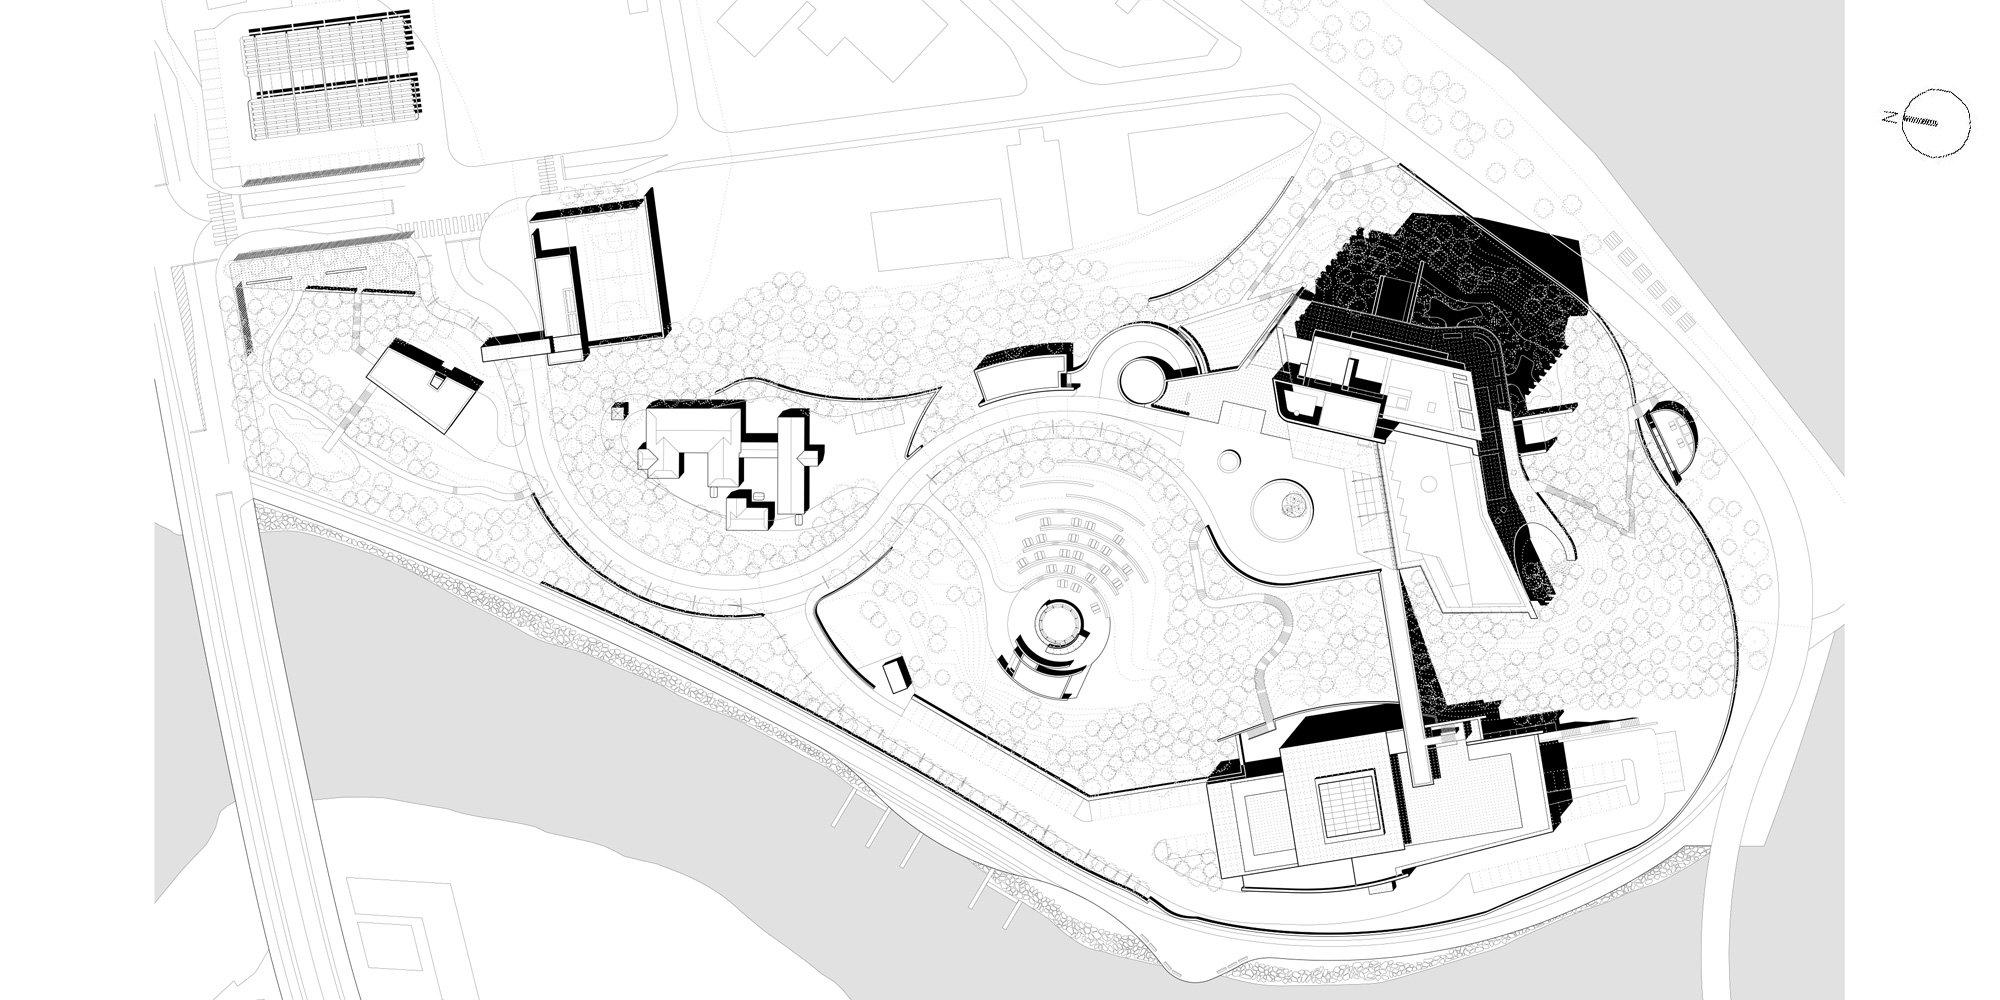 Site Plan © Richard Meier & Partners Architects